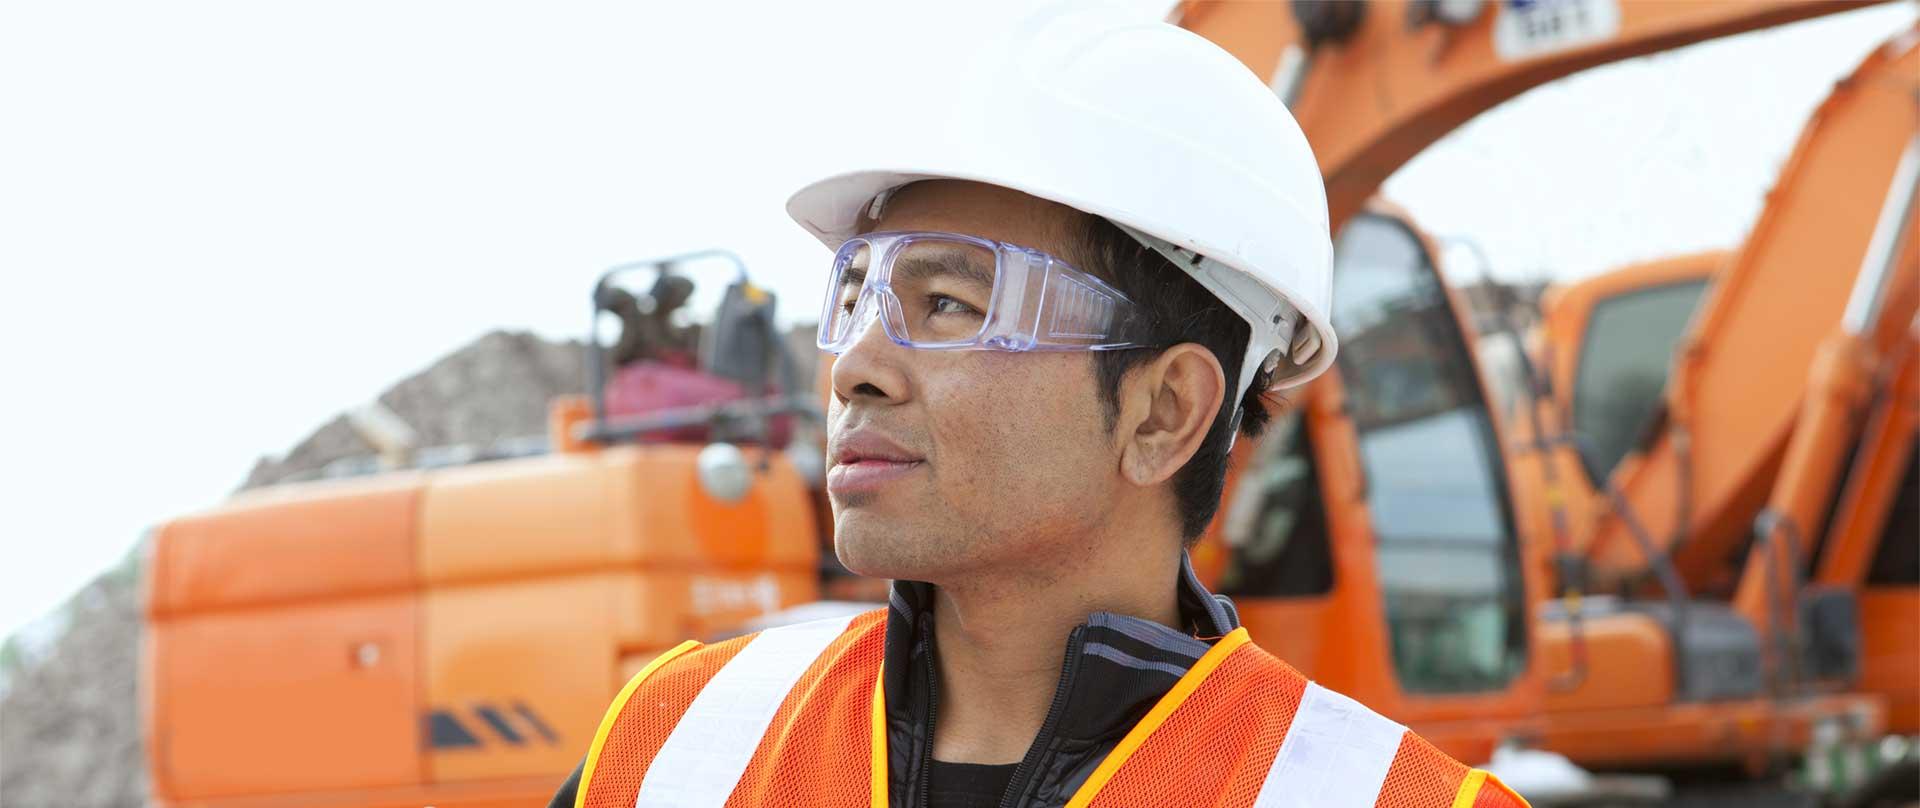 My Safety Coach Ltd